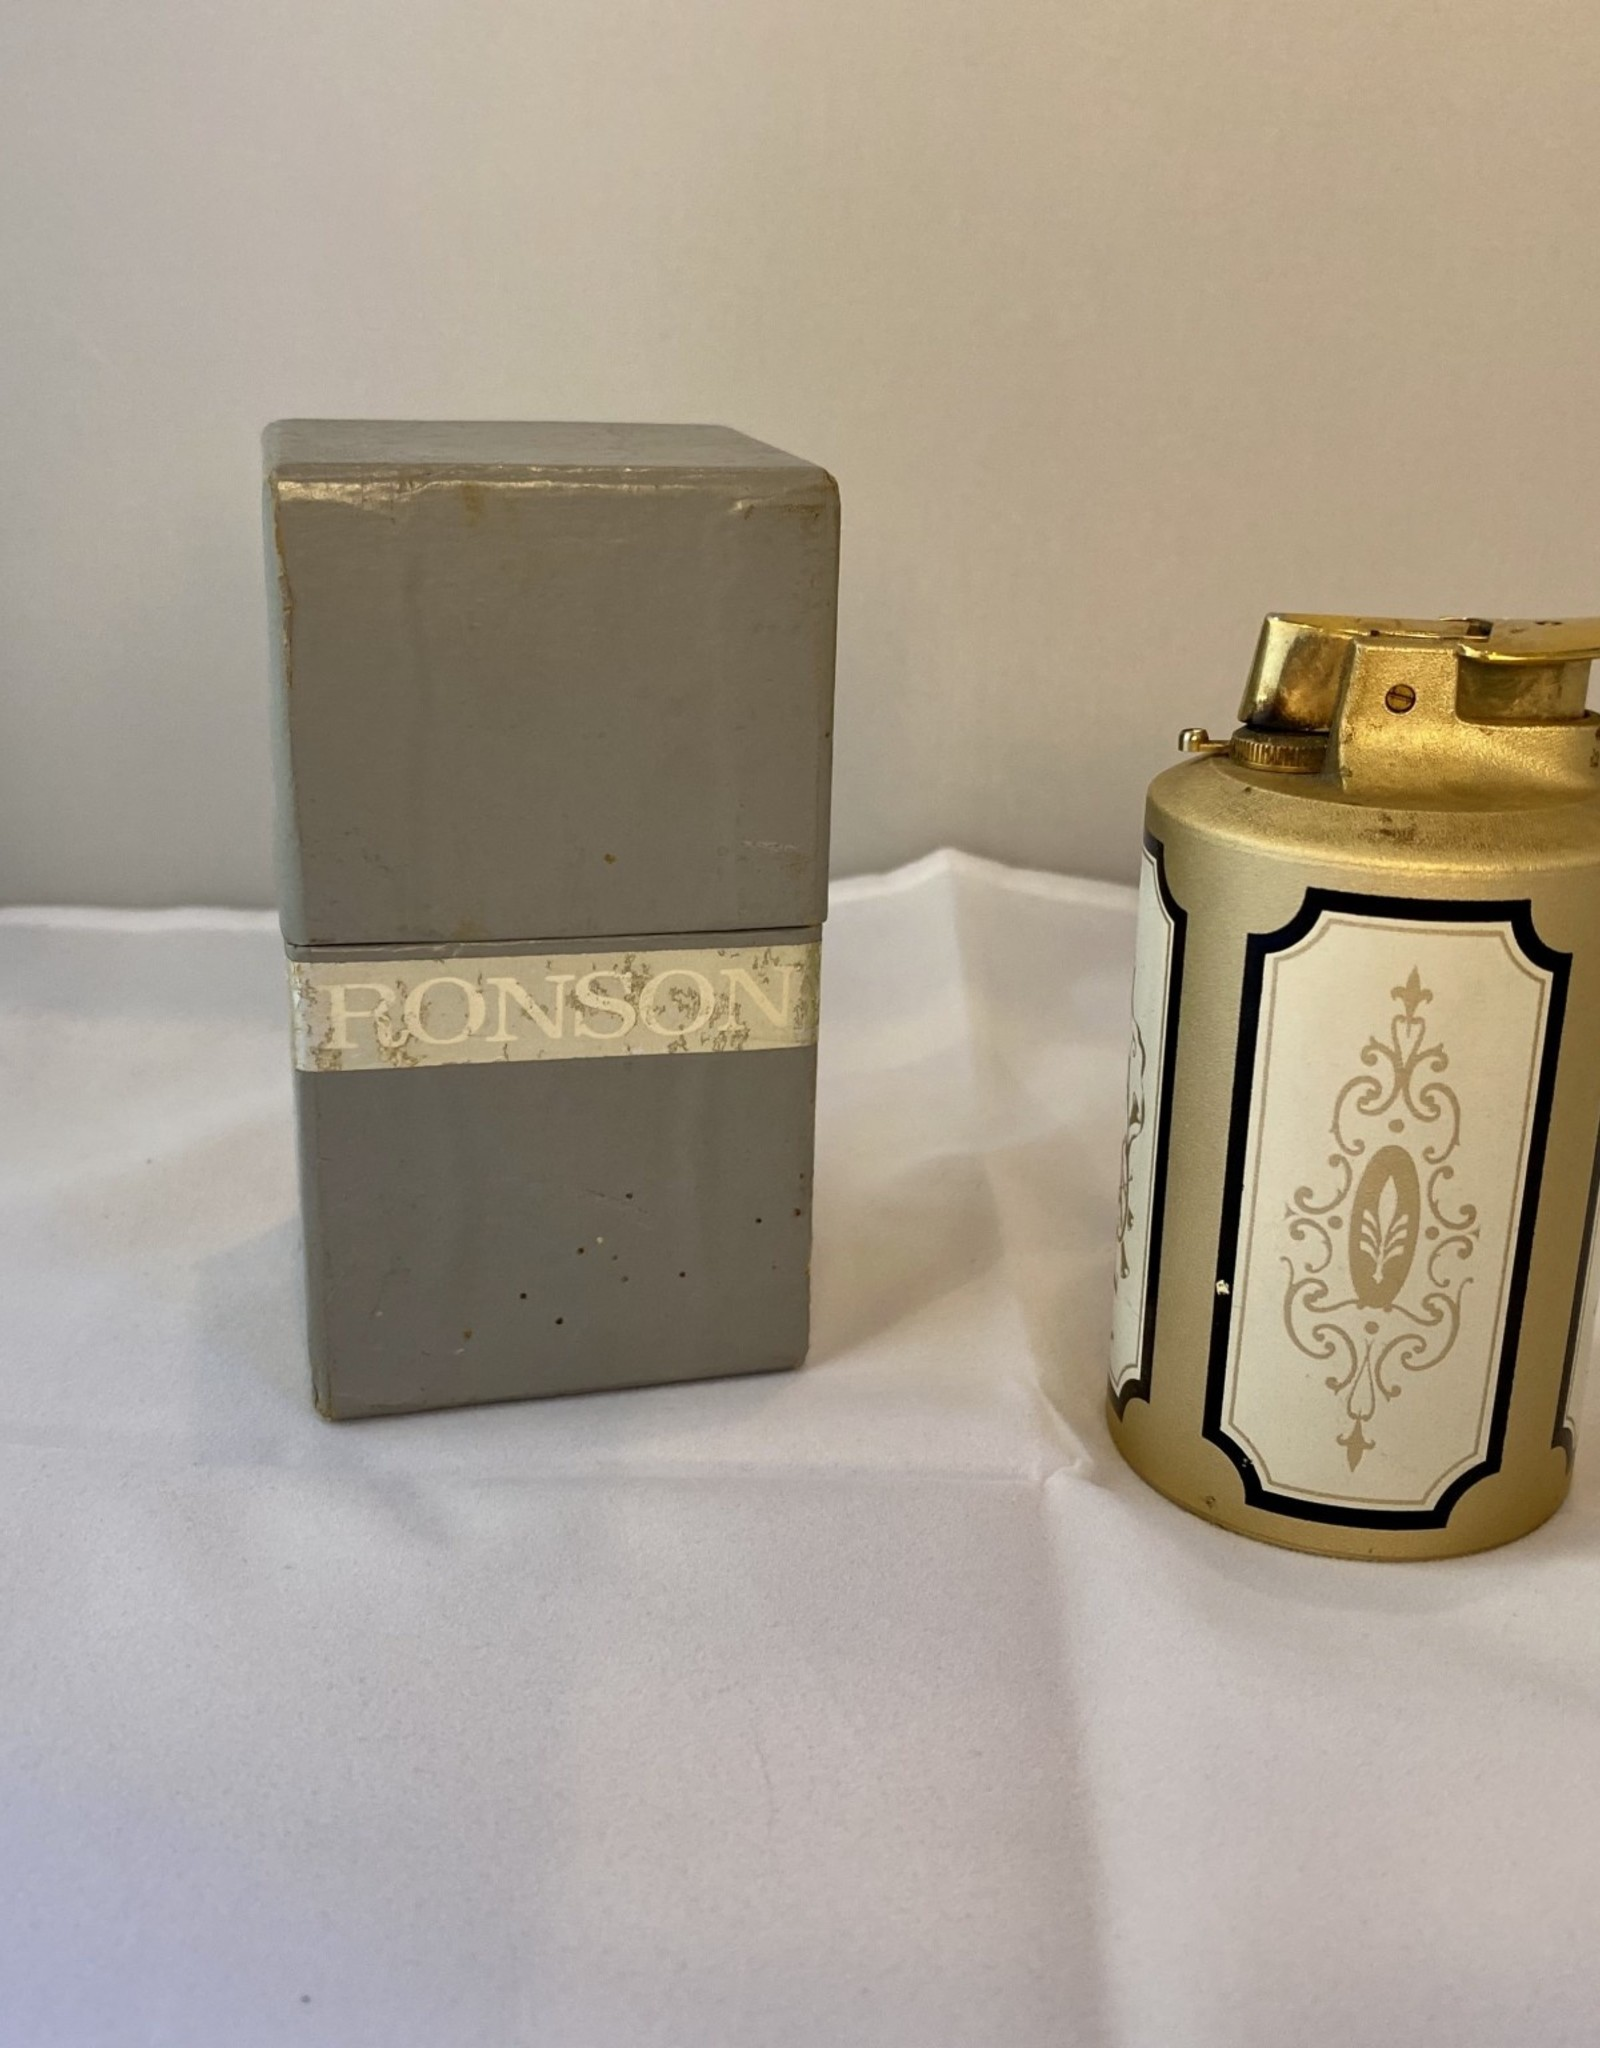 Ronson Table Lighter - Varaflame Saturn